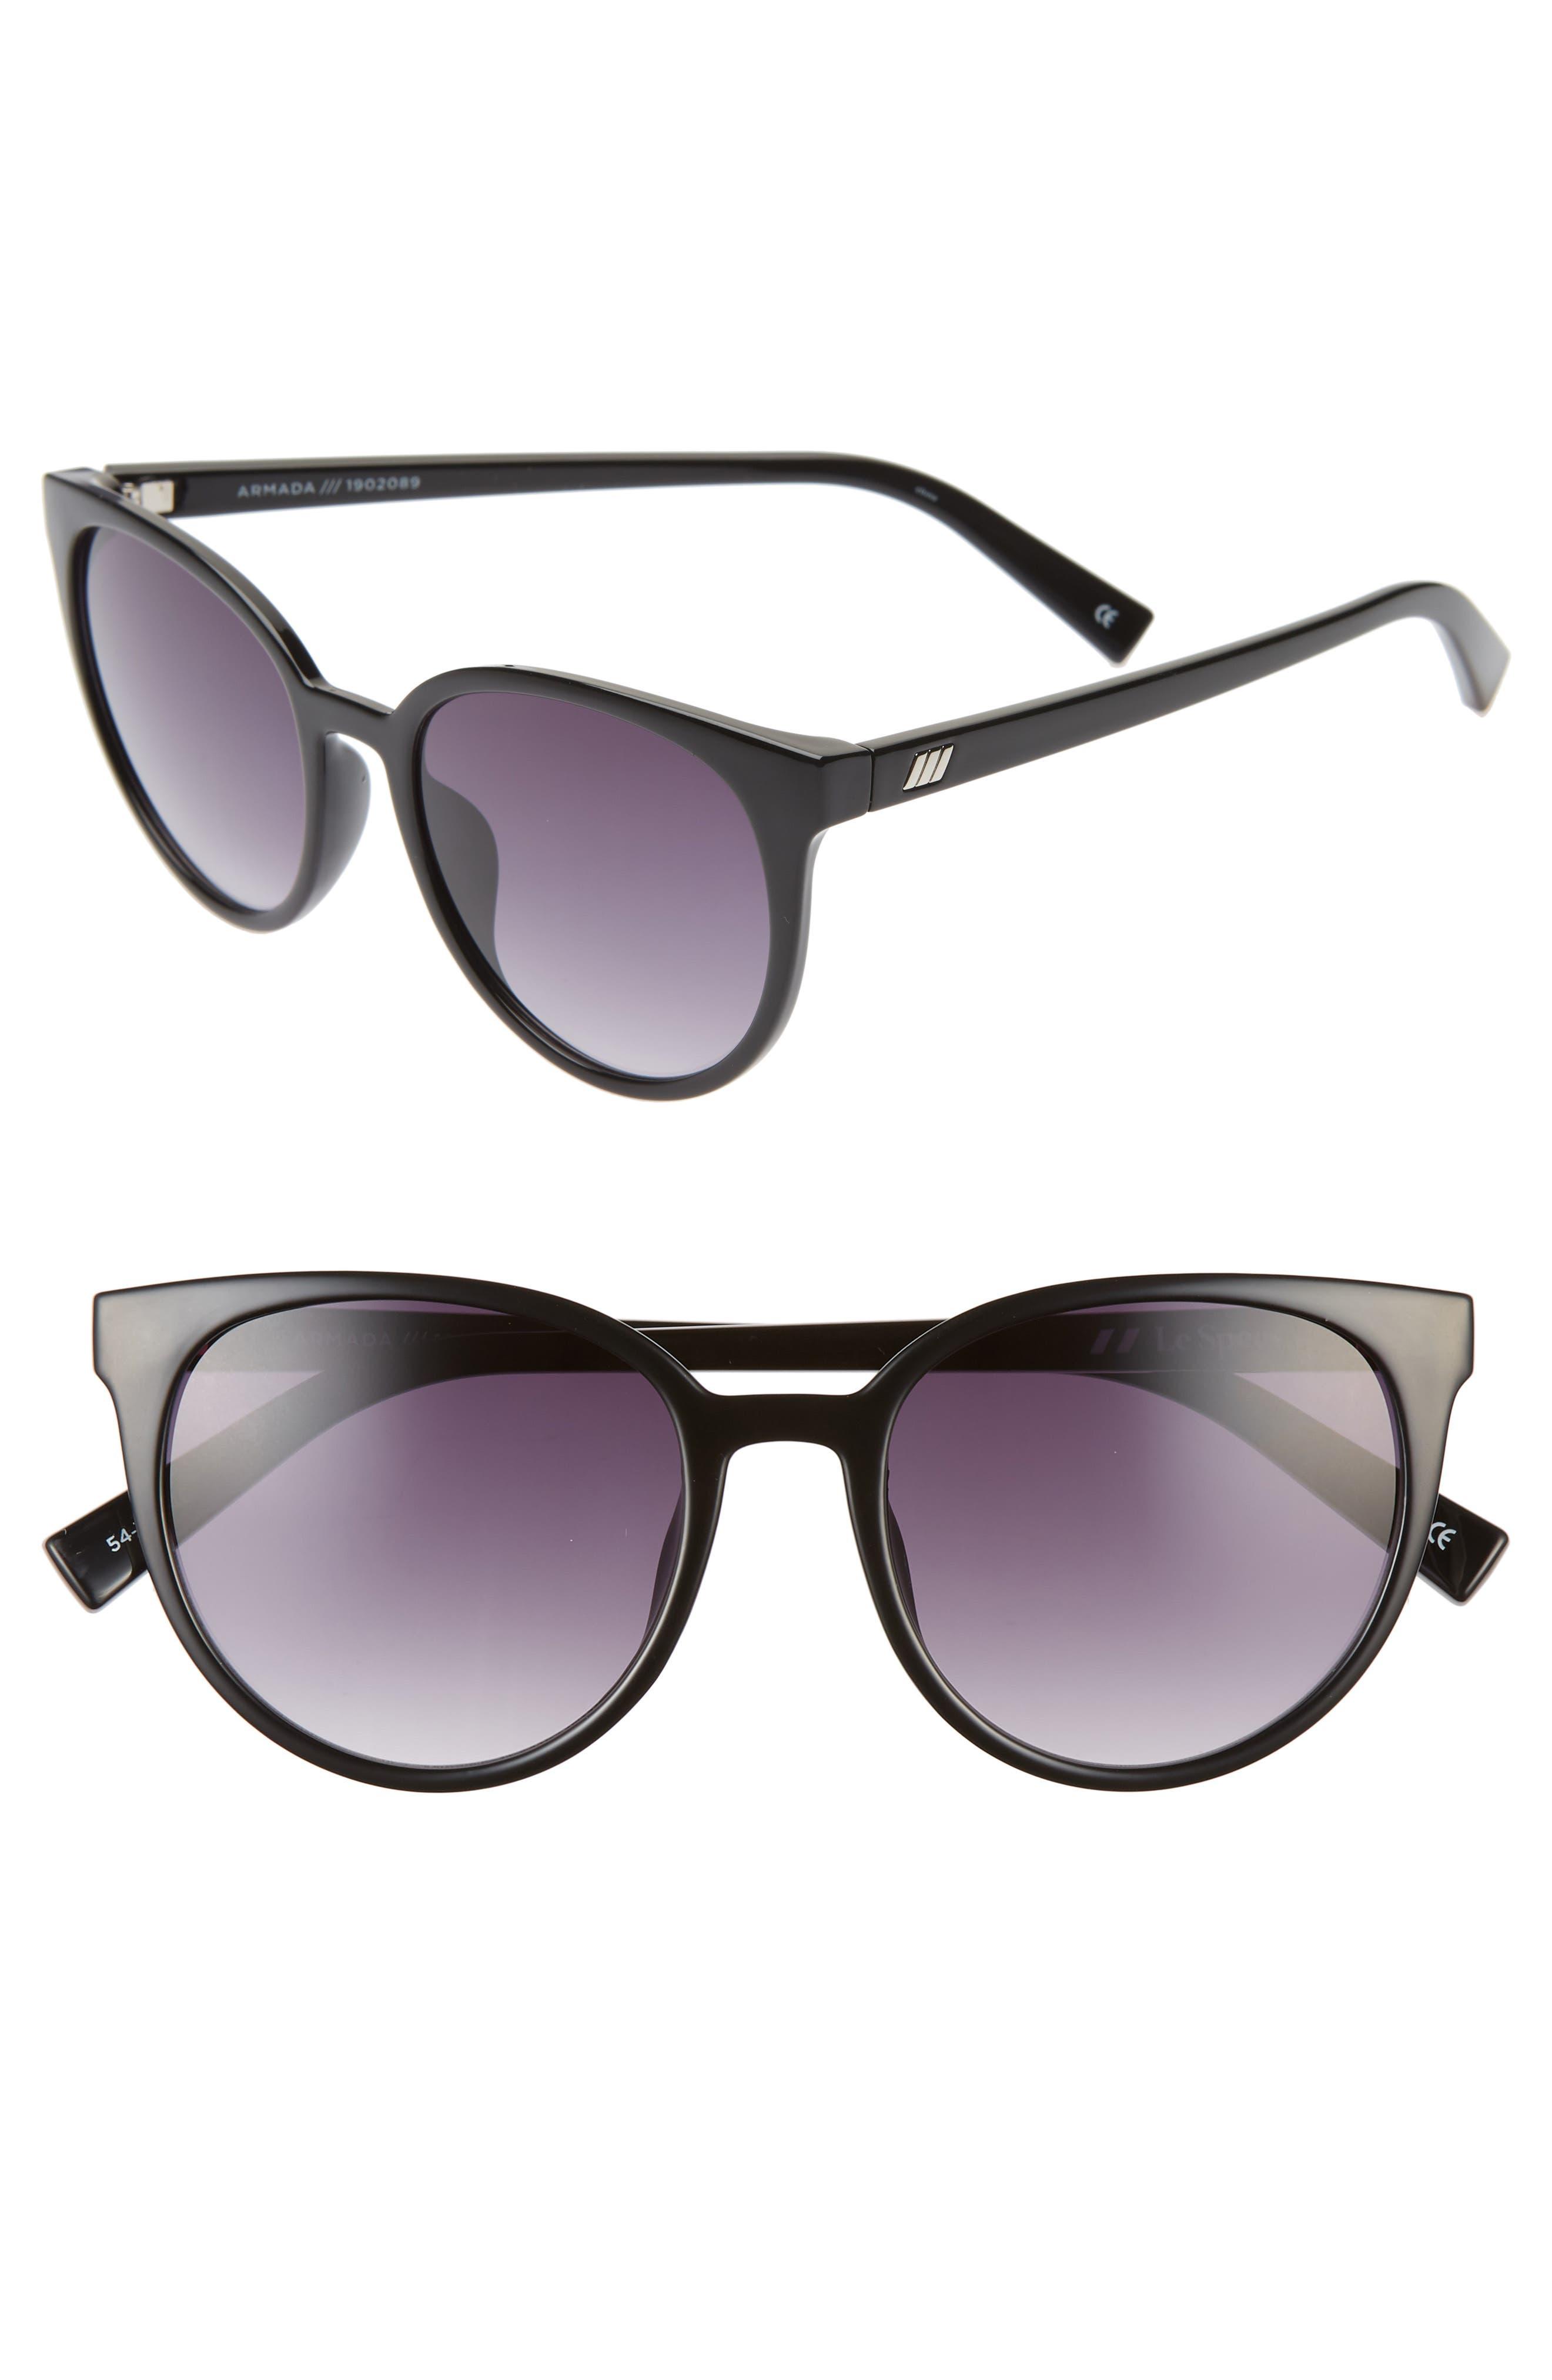 Le Specs Armada 5m Cat Eye Sunglasses - Black/ Smoke Gradient